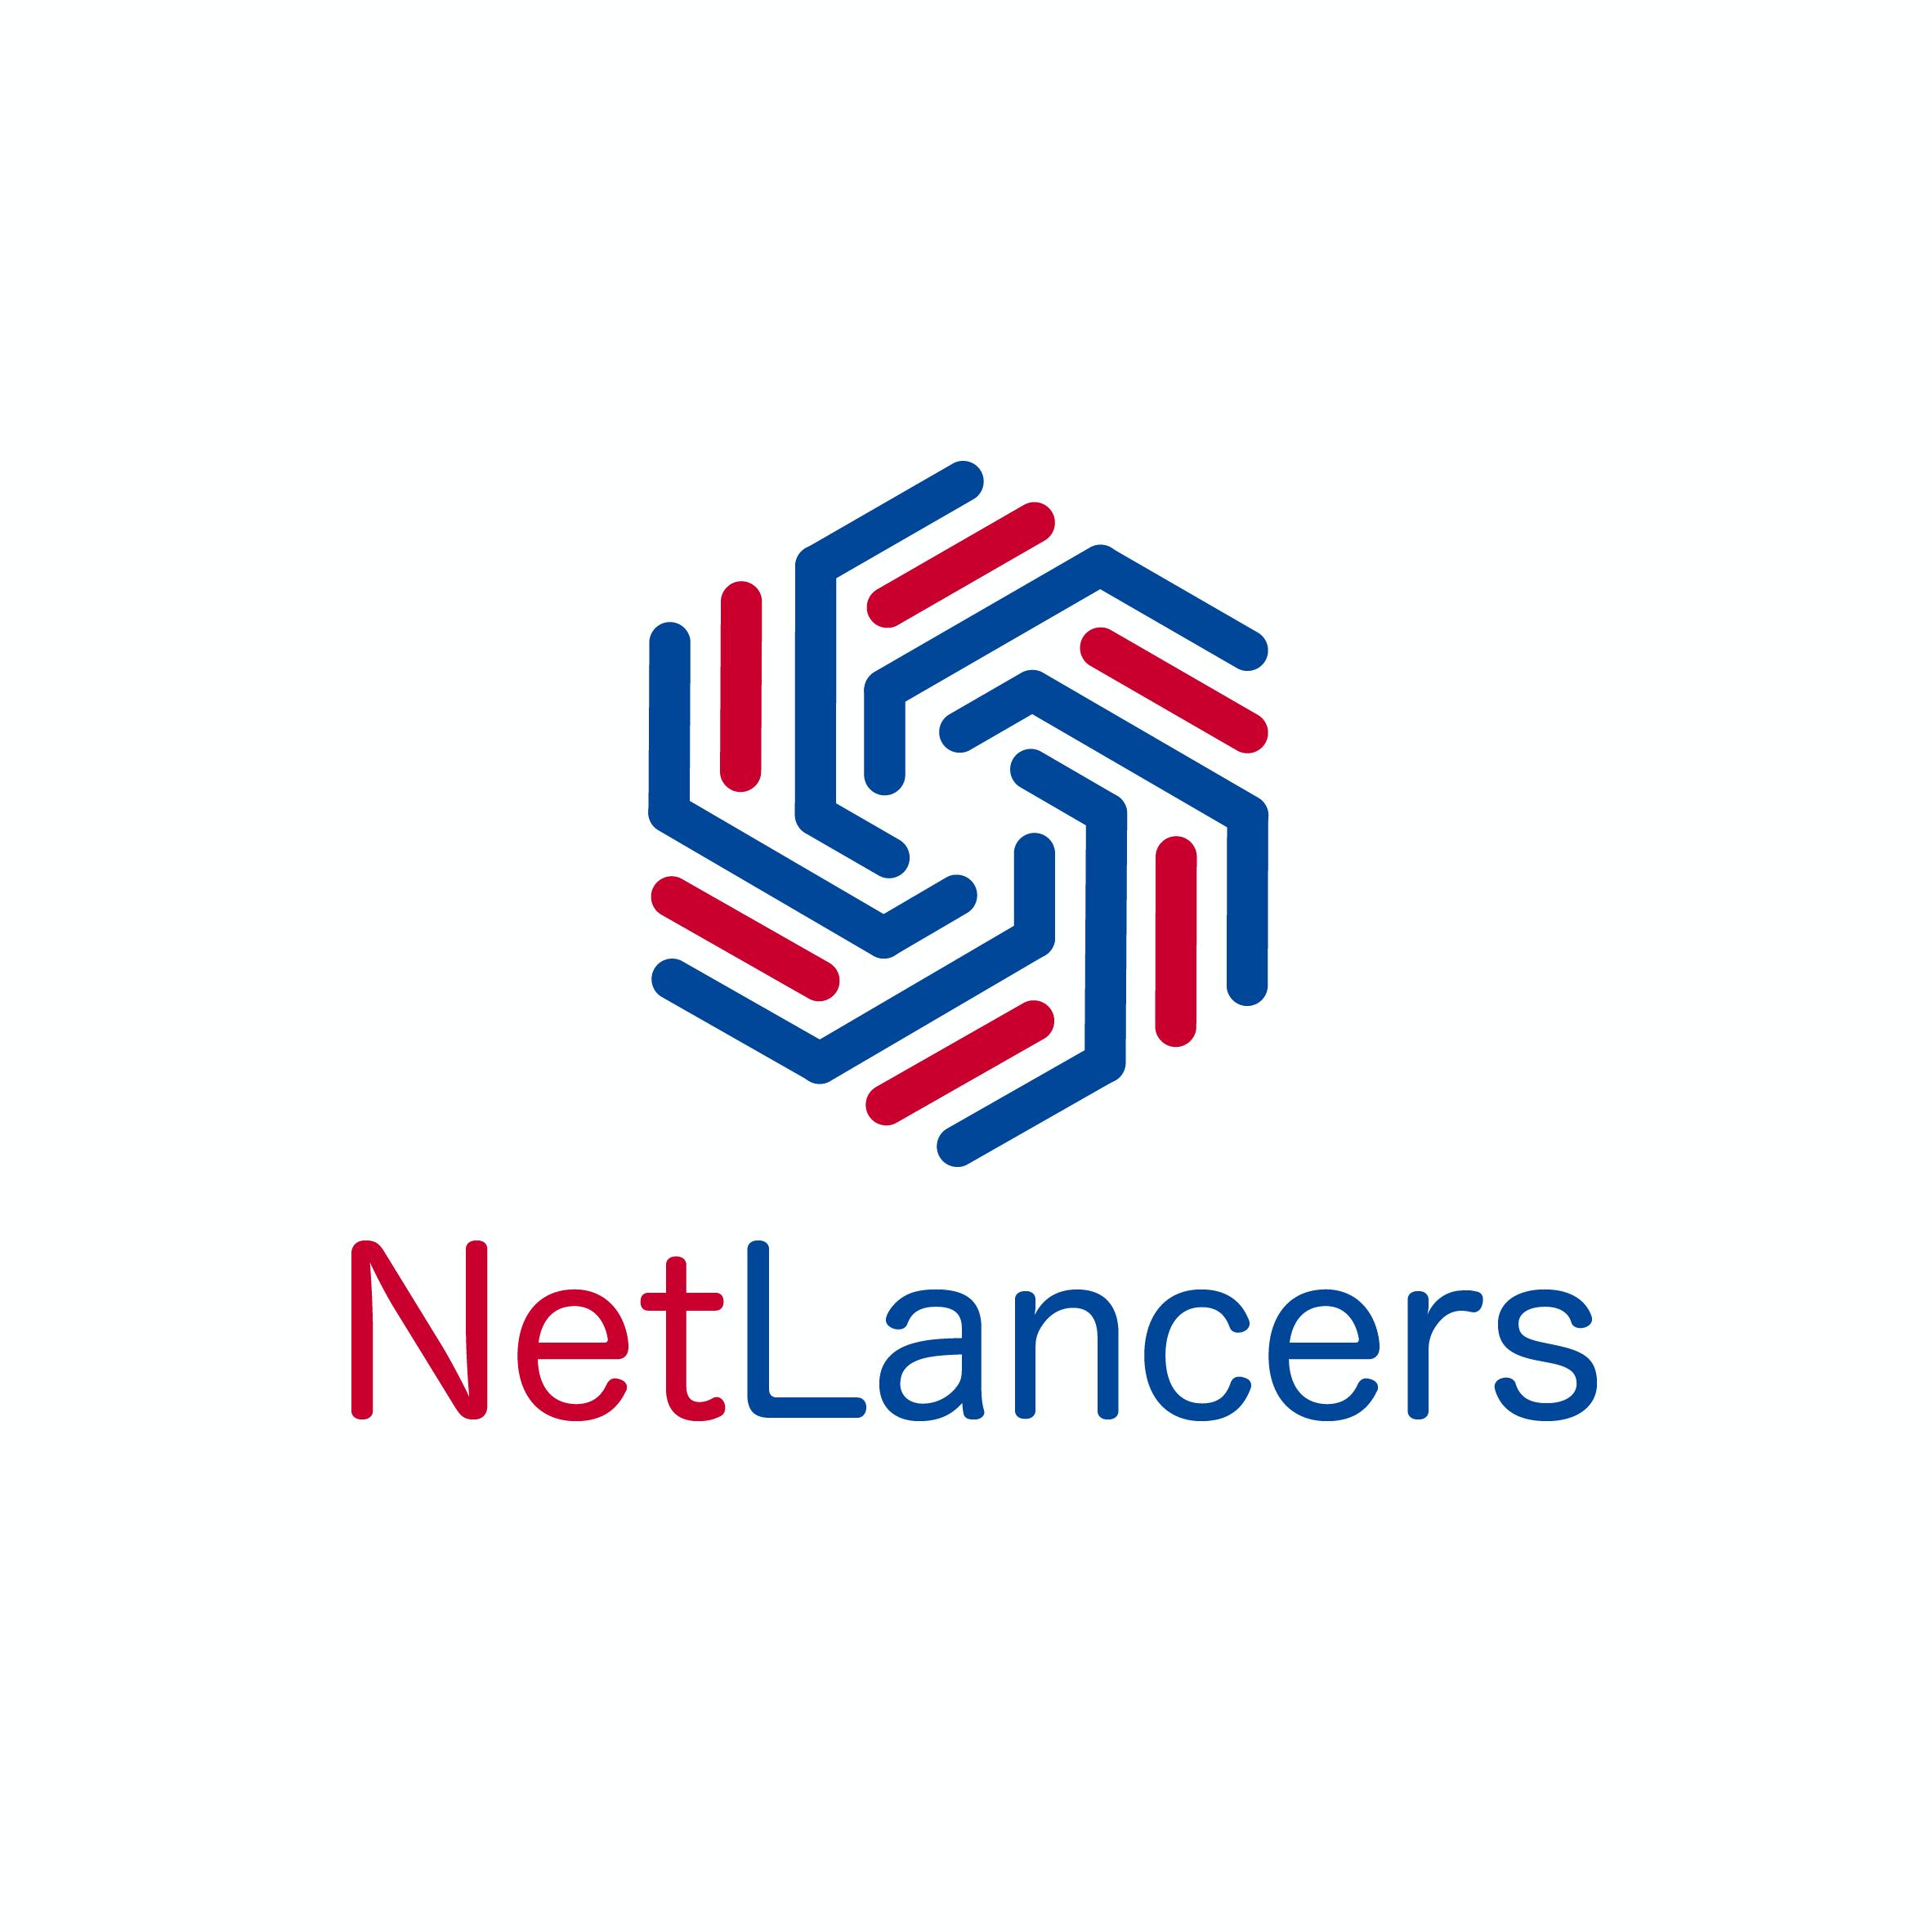 Netlancers